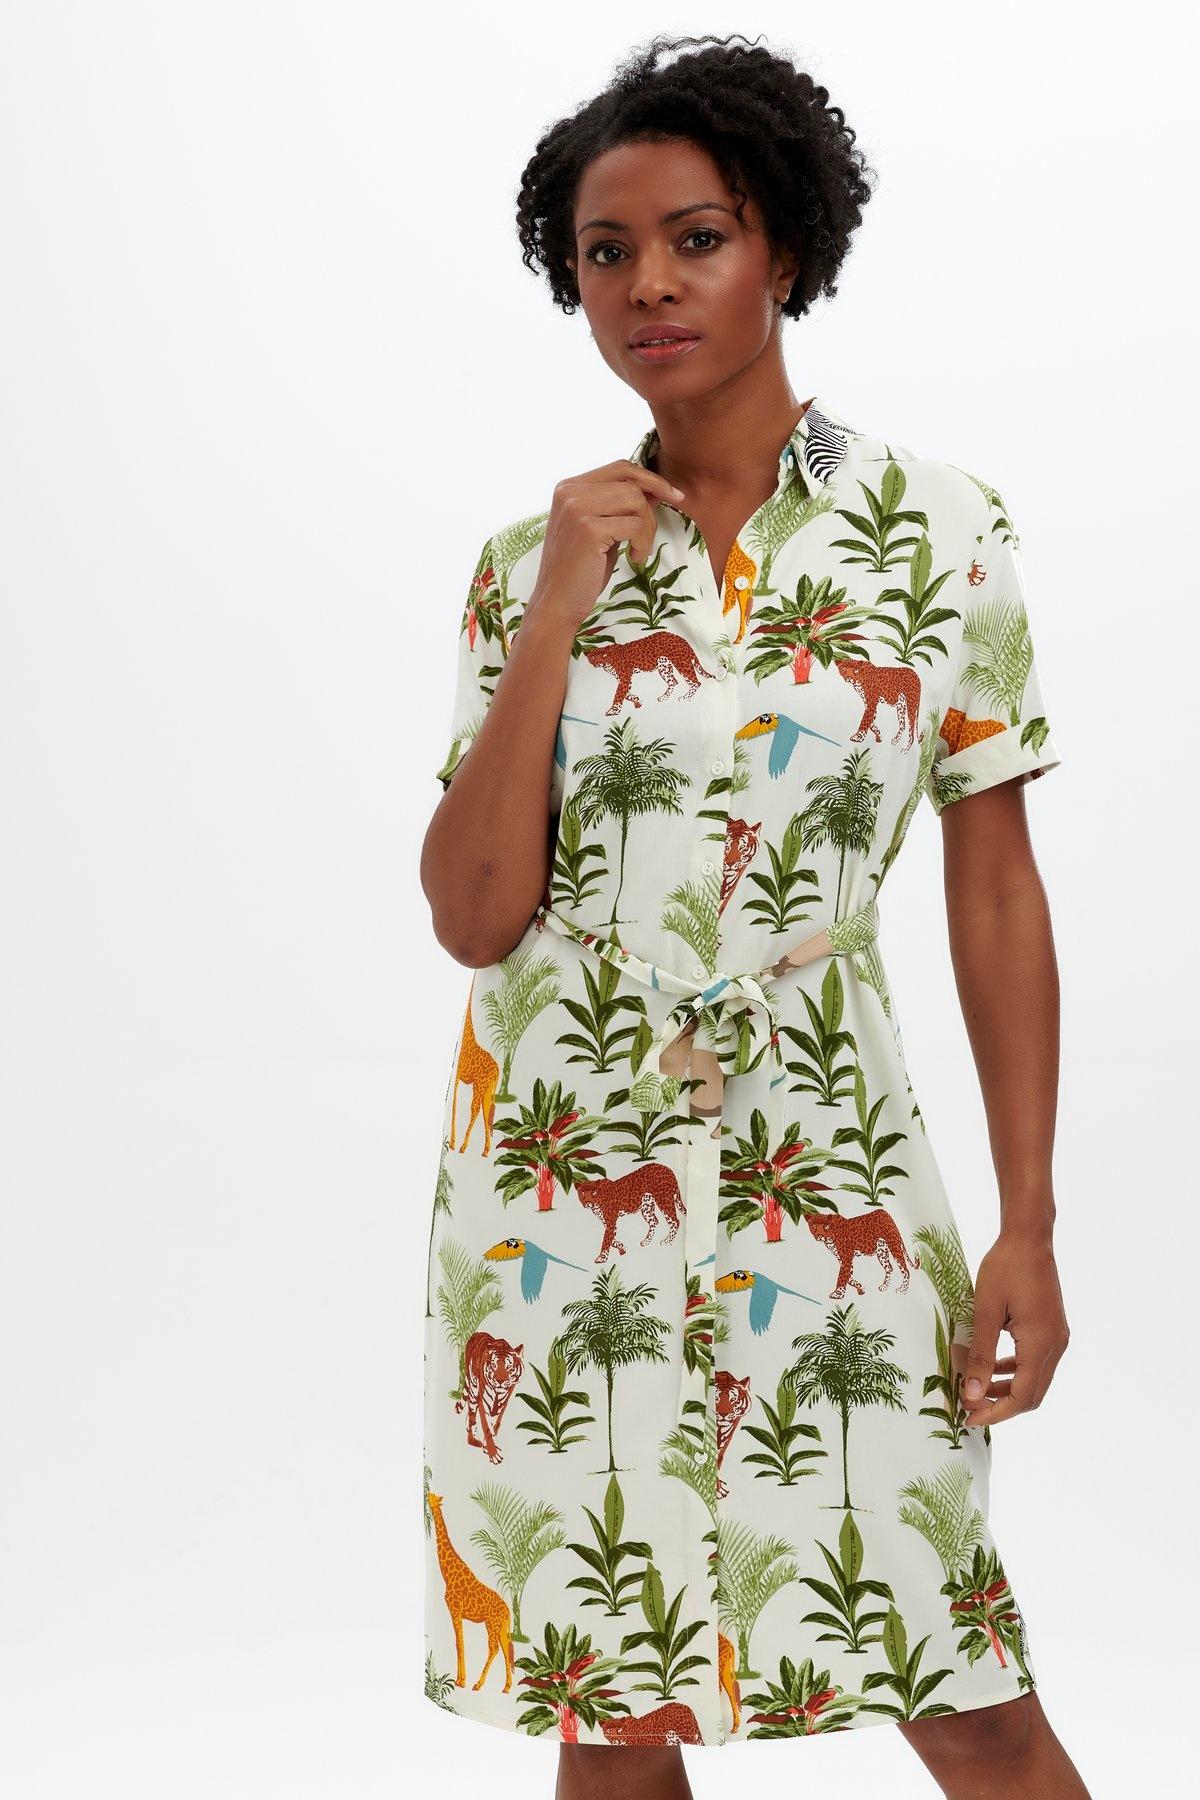 Sugarhill Brighton Justine Shirt Dress in Jungle Animals